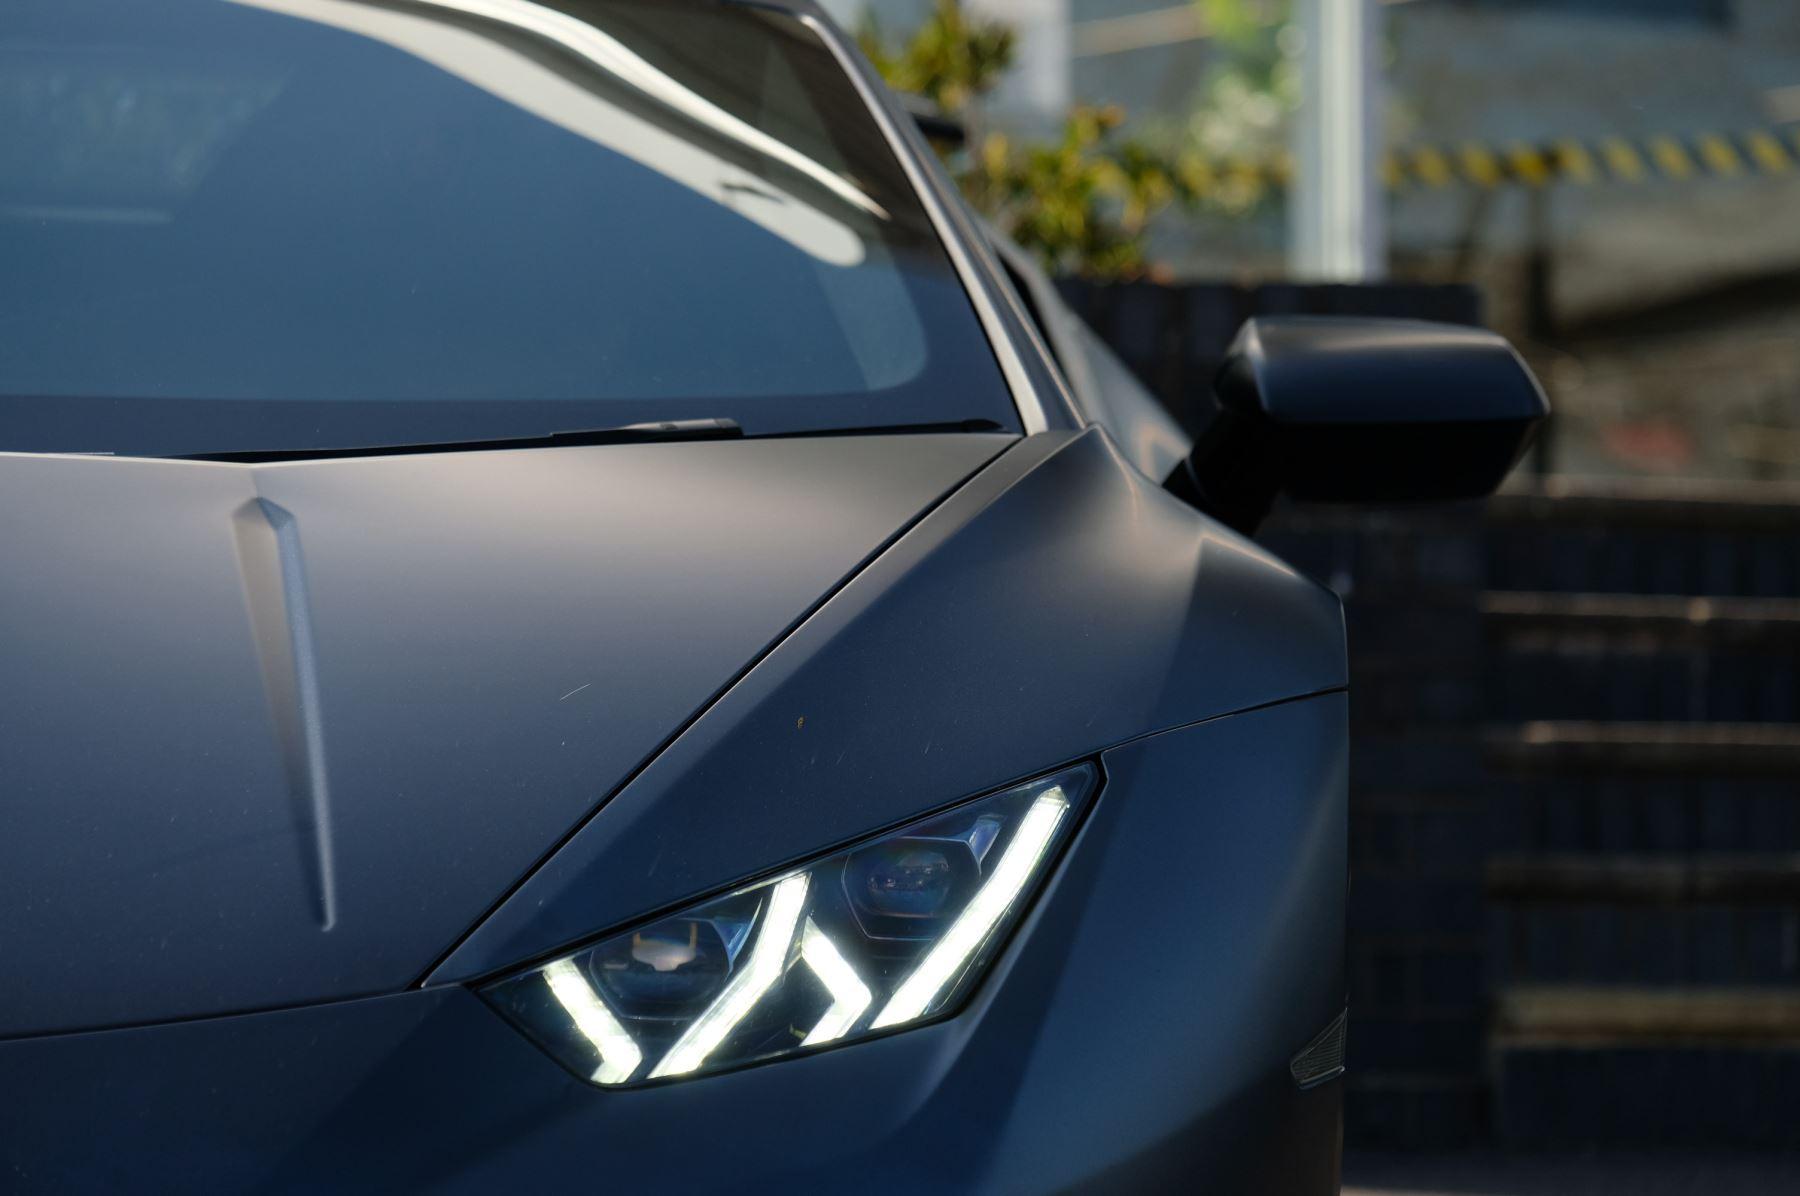 Lamborghini Huracan Performante LP 640-4 2dr LDF - Carbon Ceramic Brakes - Carbon Fiber Features - Comfort Seats image 10